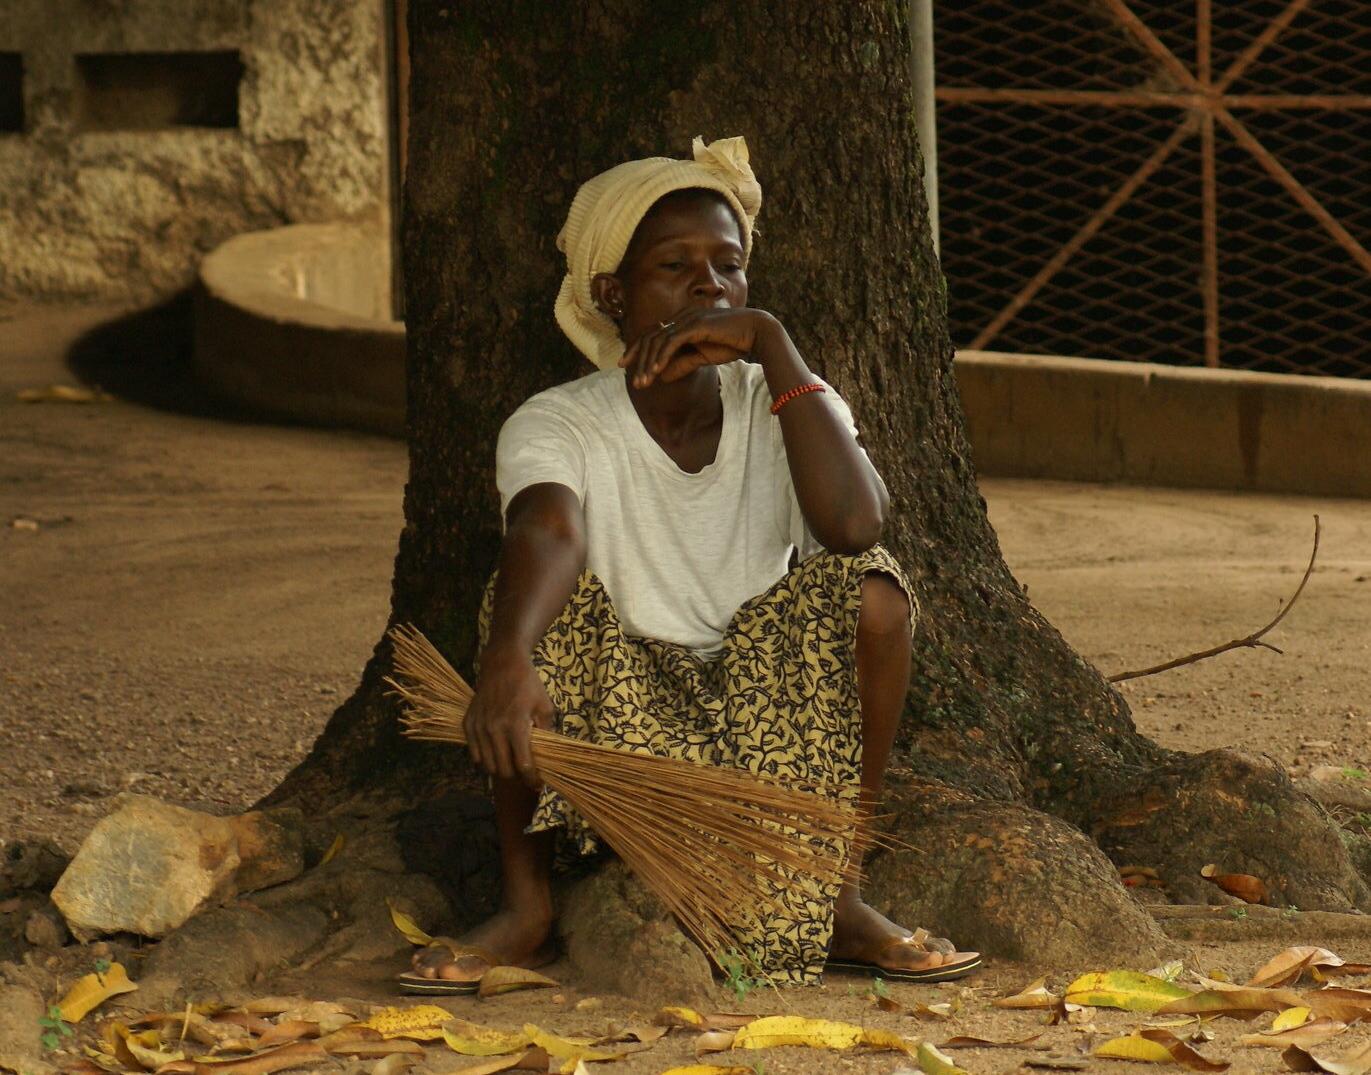 Poverty in Togo